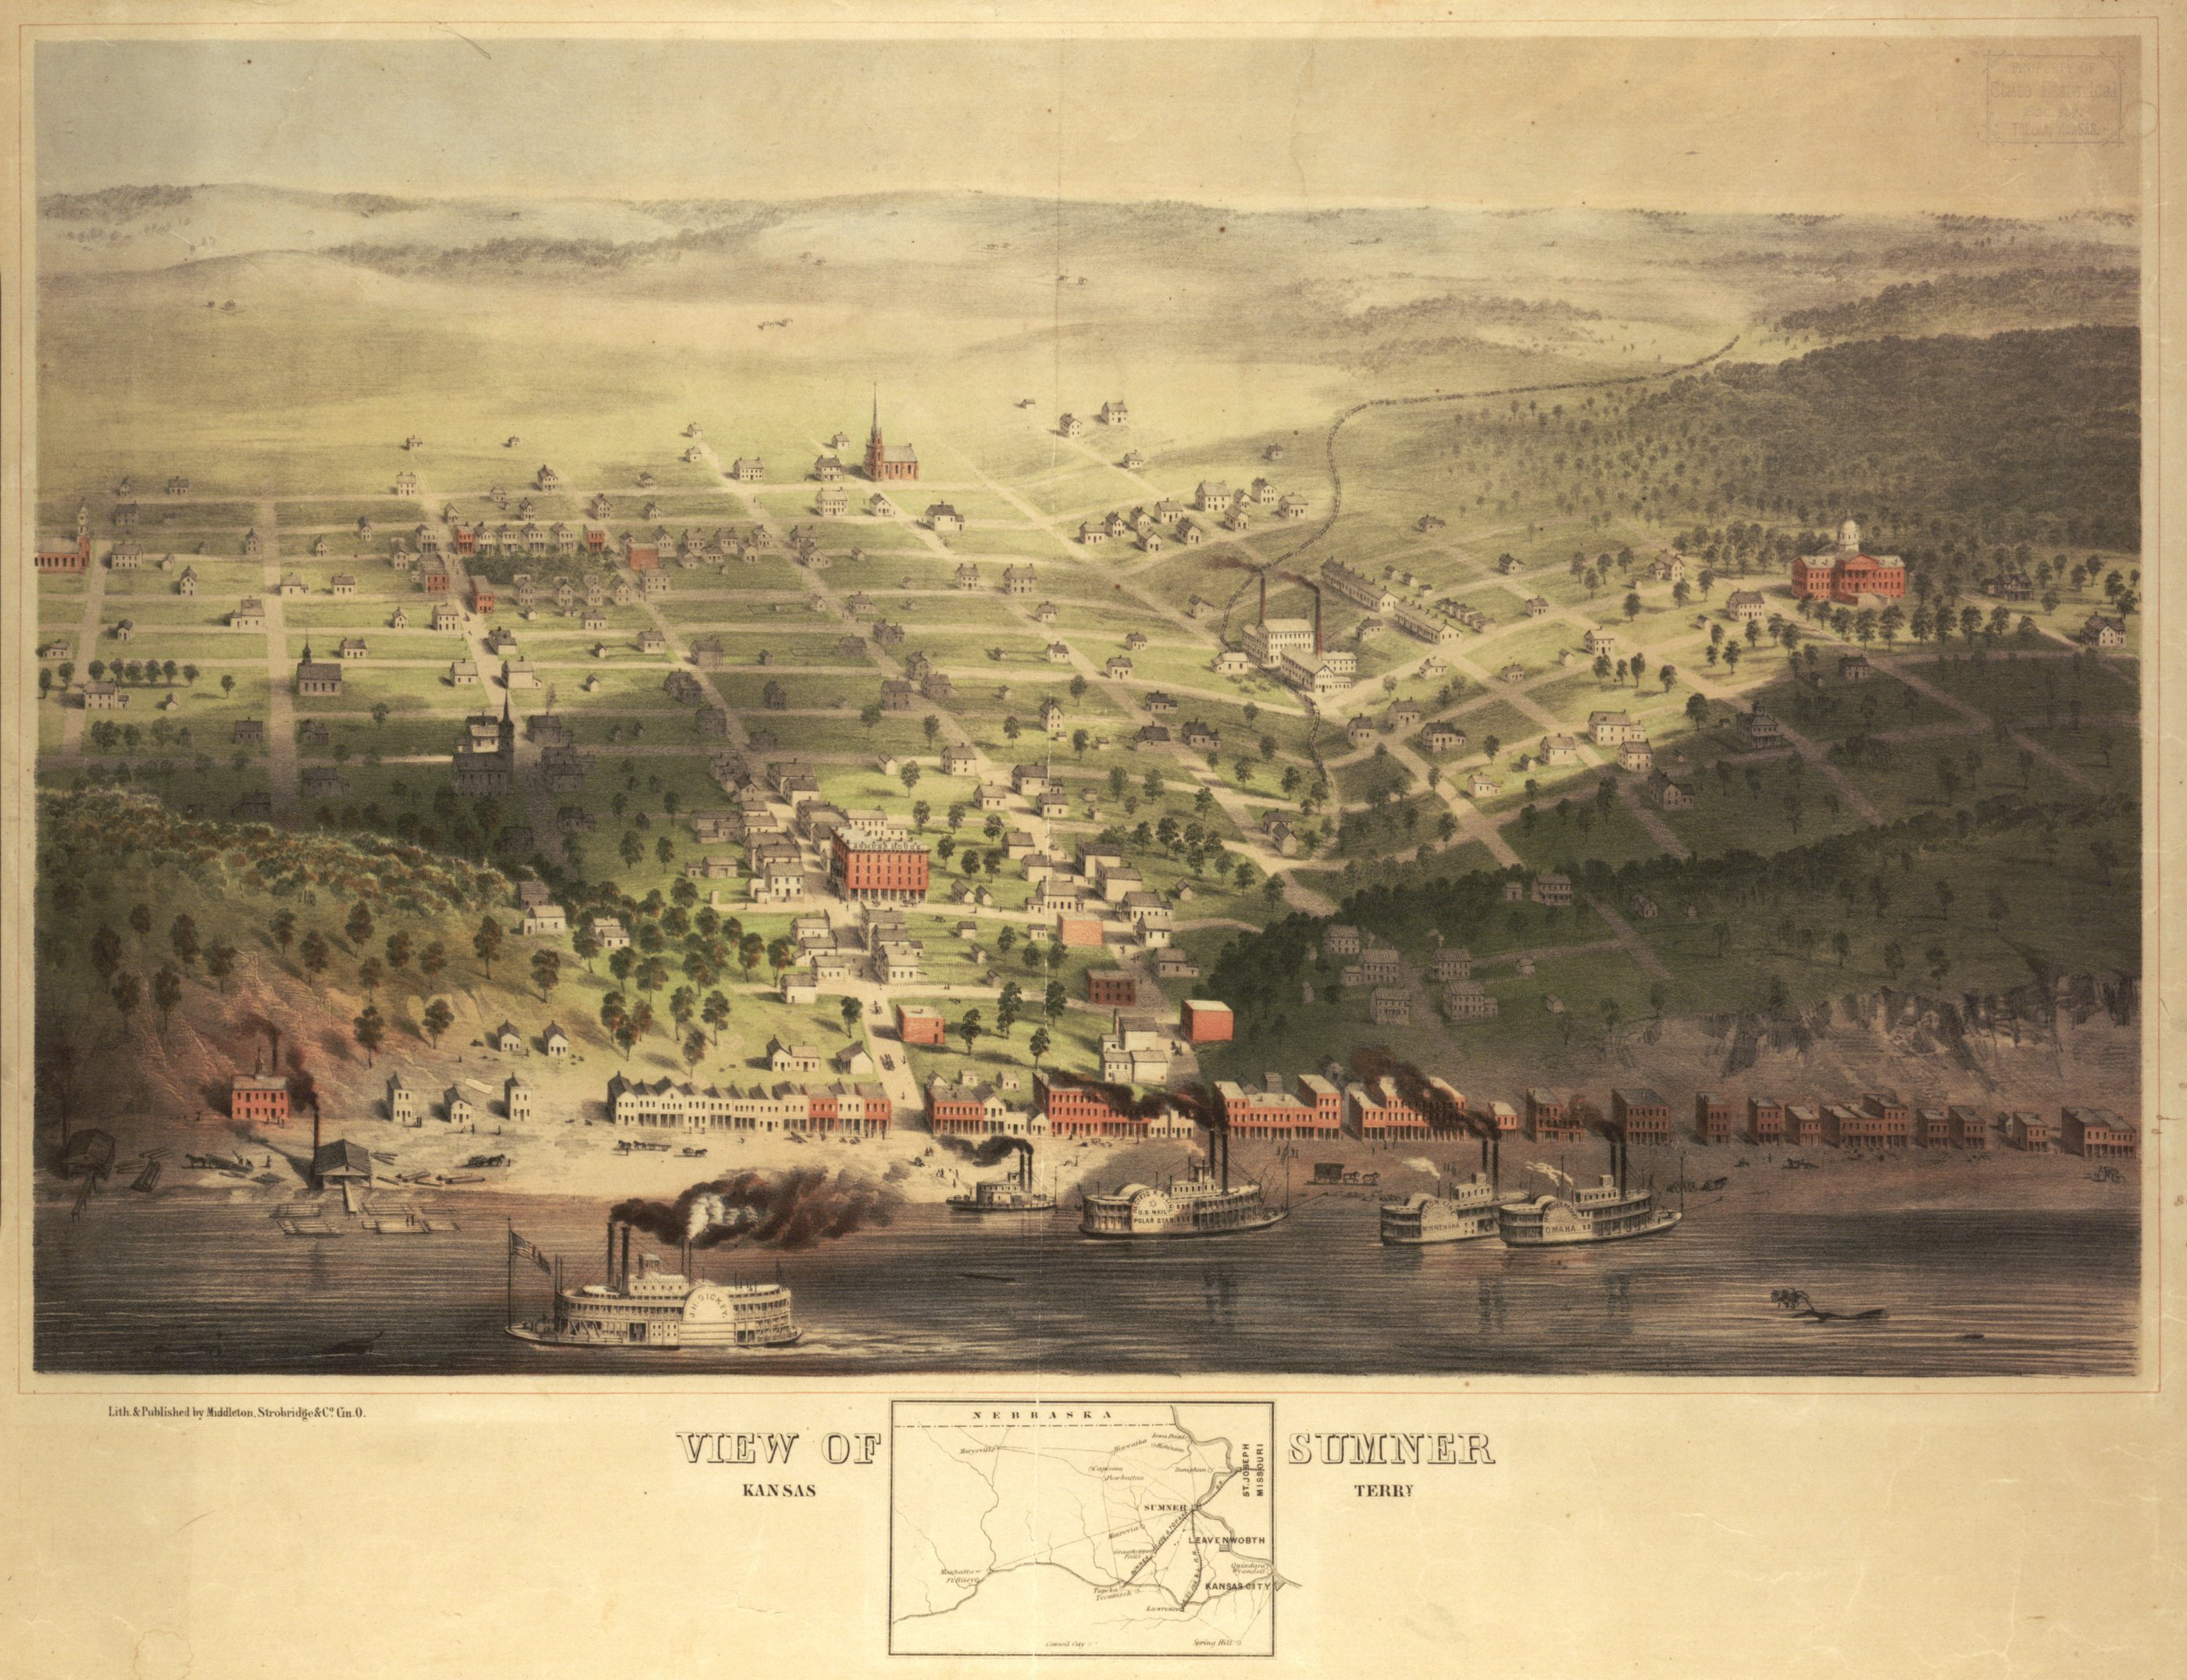 Sumner, Kansas Territory